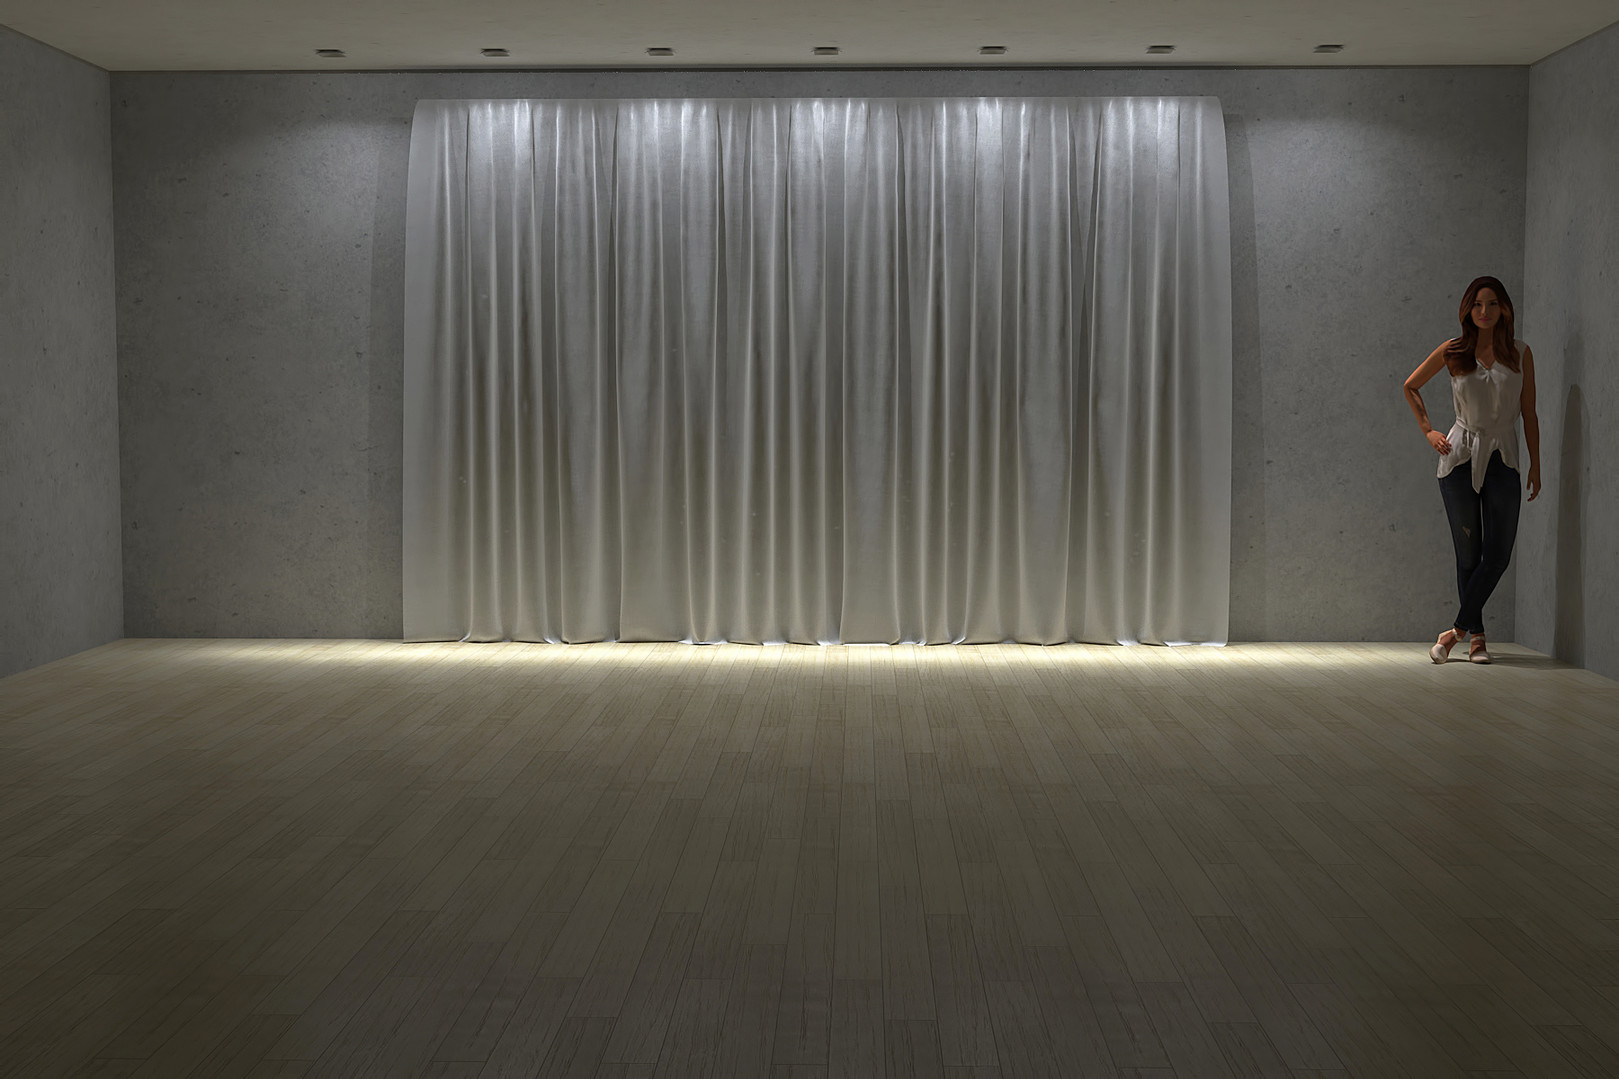 Certus lighting подсветка штор.jpg